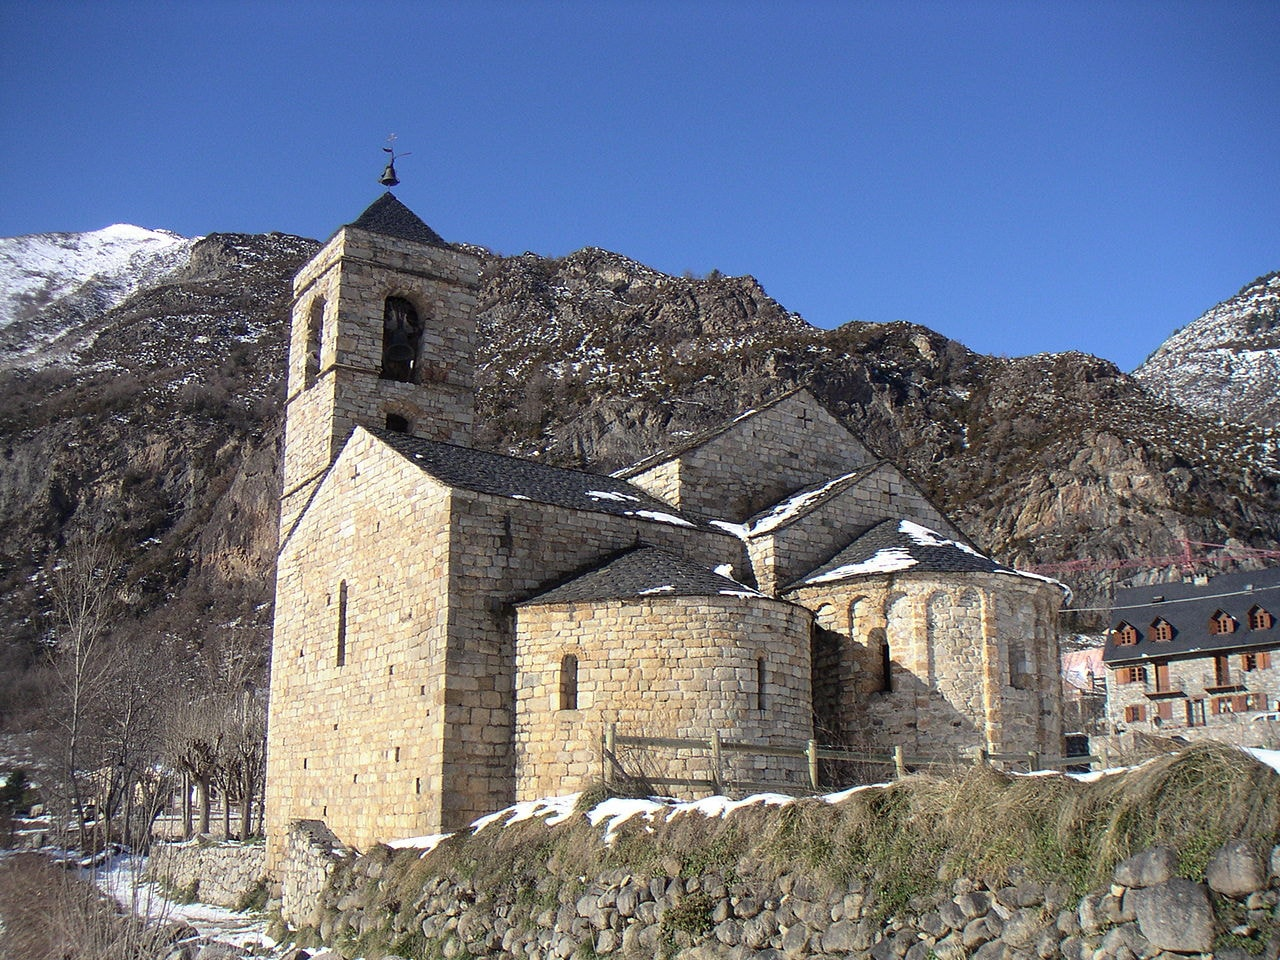 Church in Barruera, Spain | C0O / Wikimedia Commons